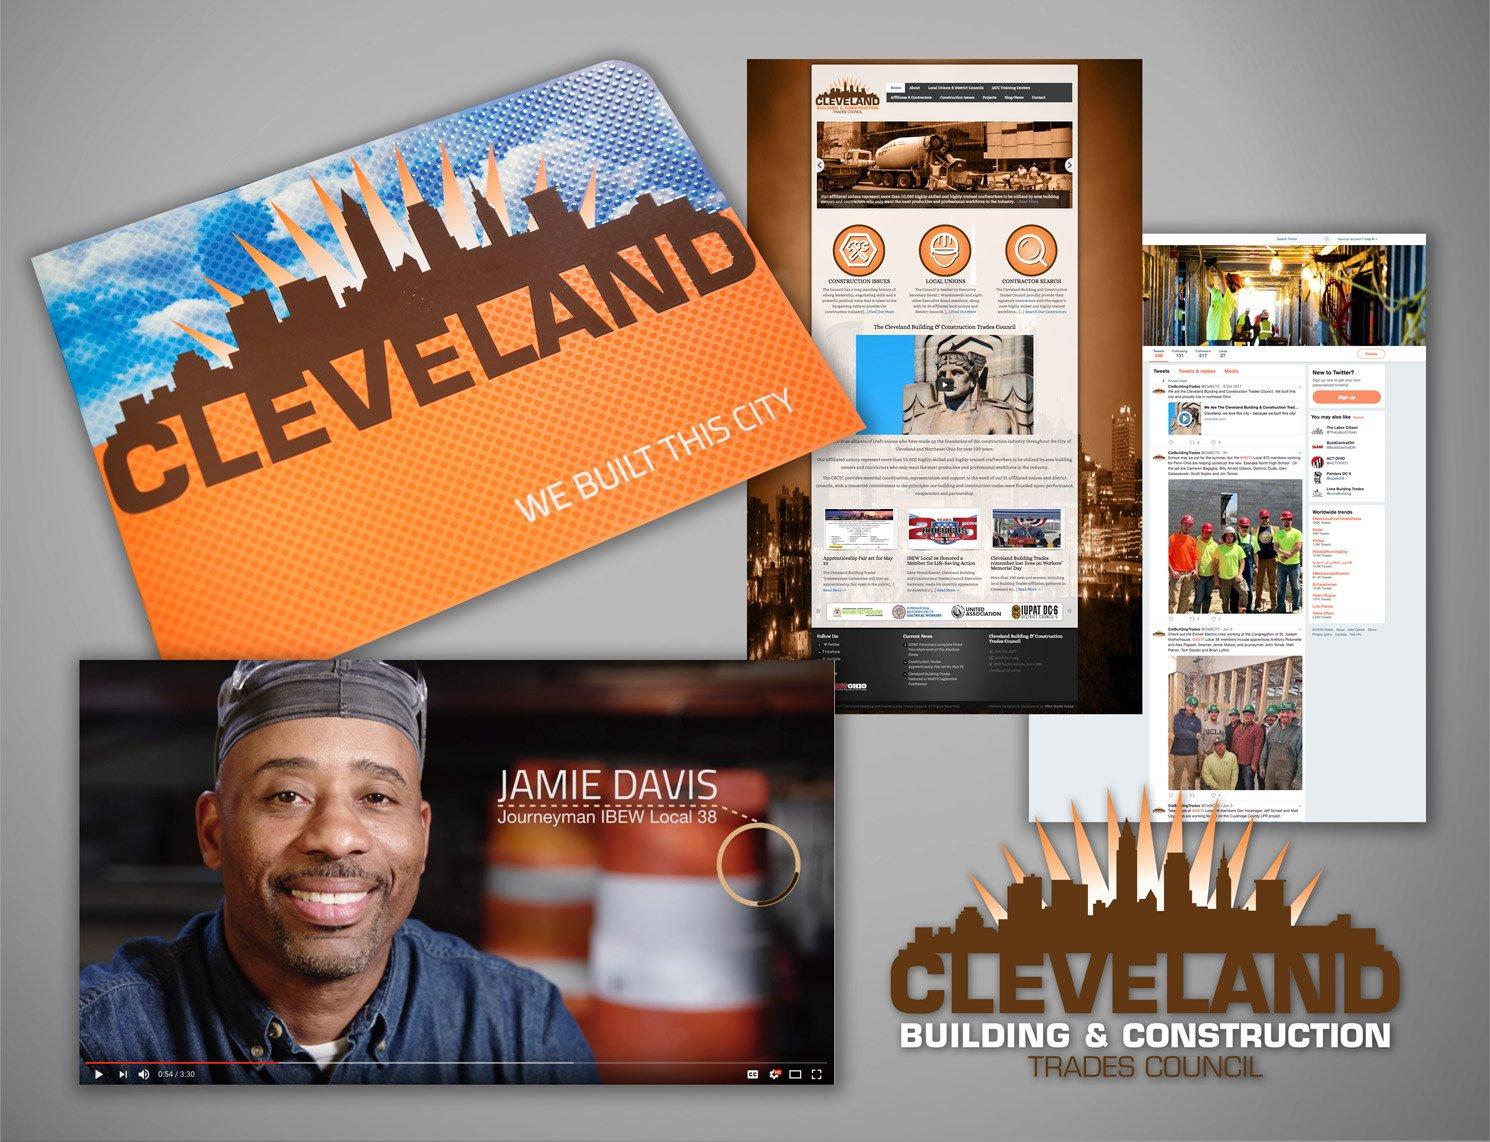 Cleveland Building Trades Union Marketing Campaign